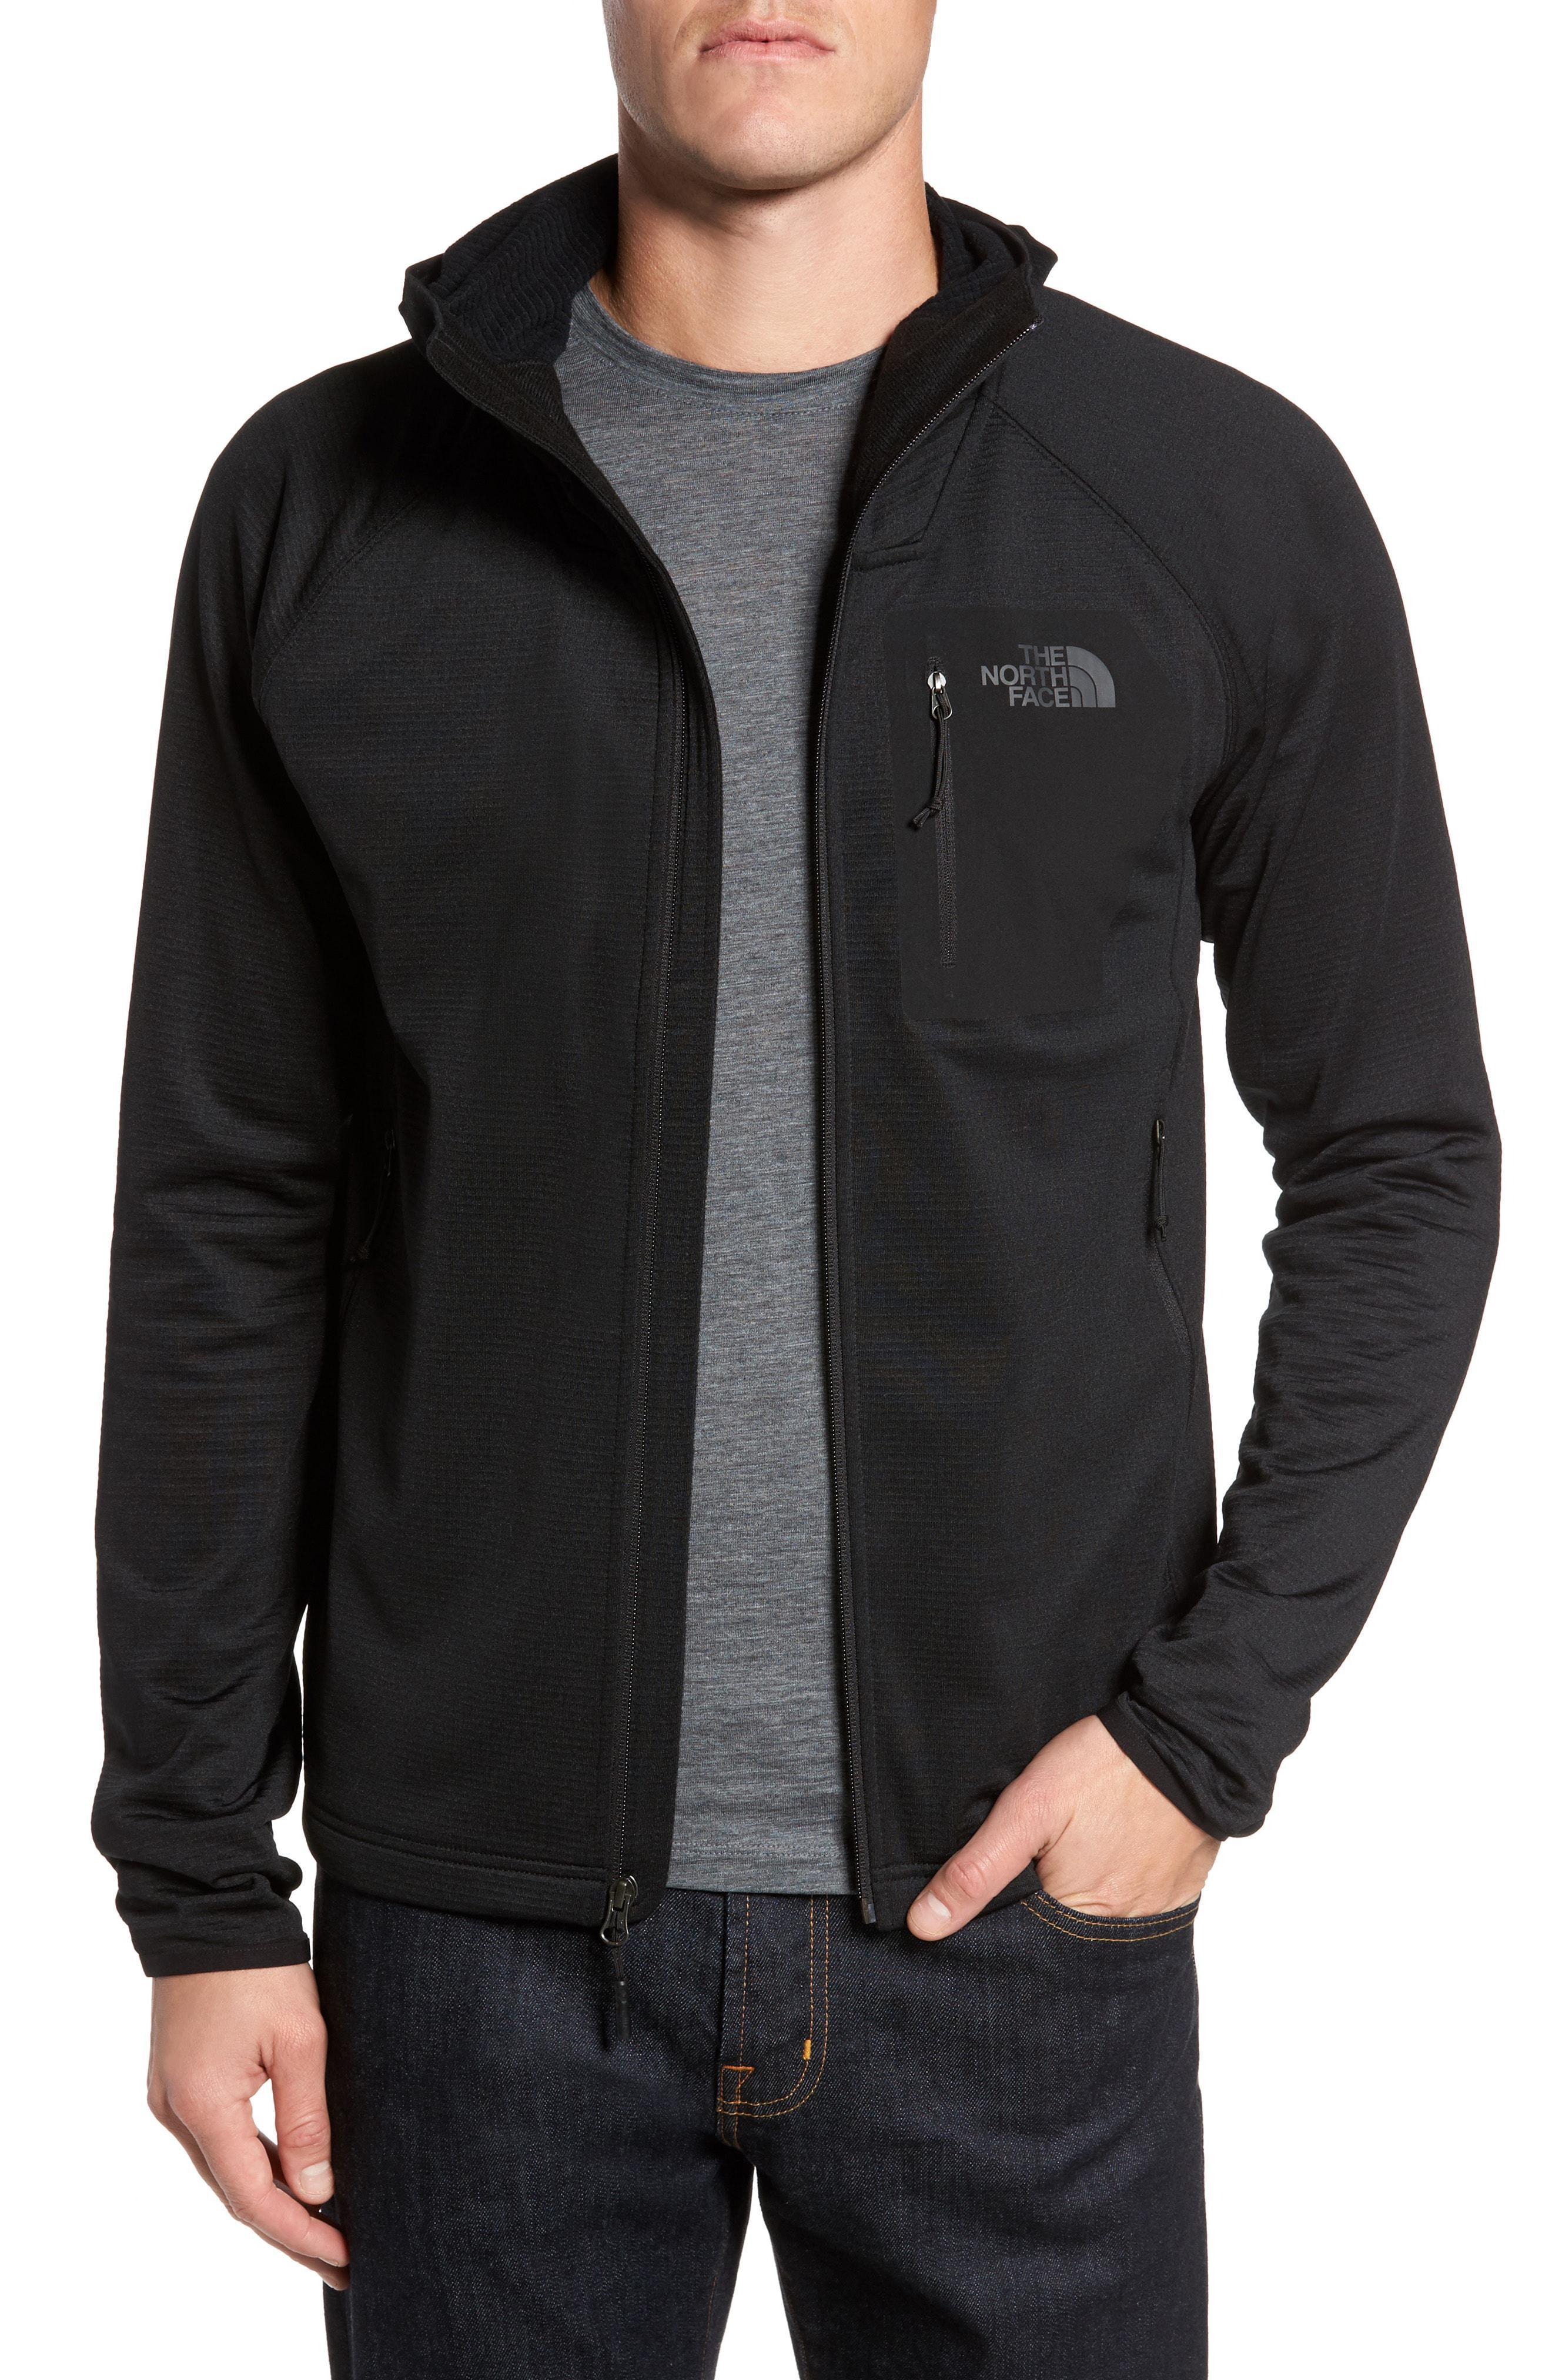 Lyst - The North Face Borod Zip Fleece Jacket in Green for Men 6e6771e82